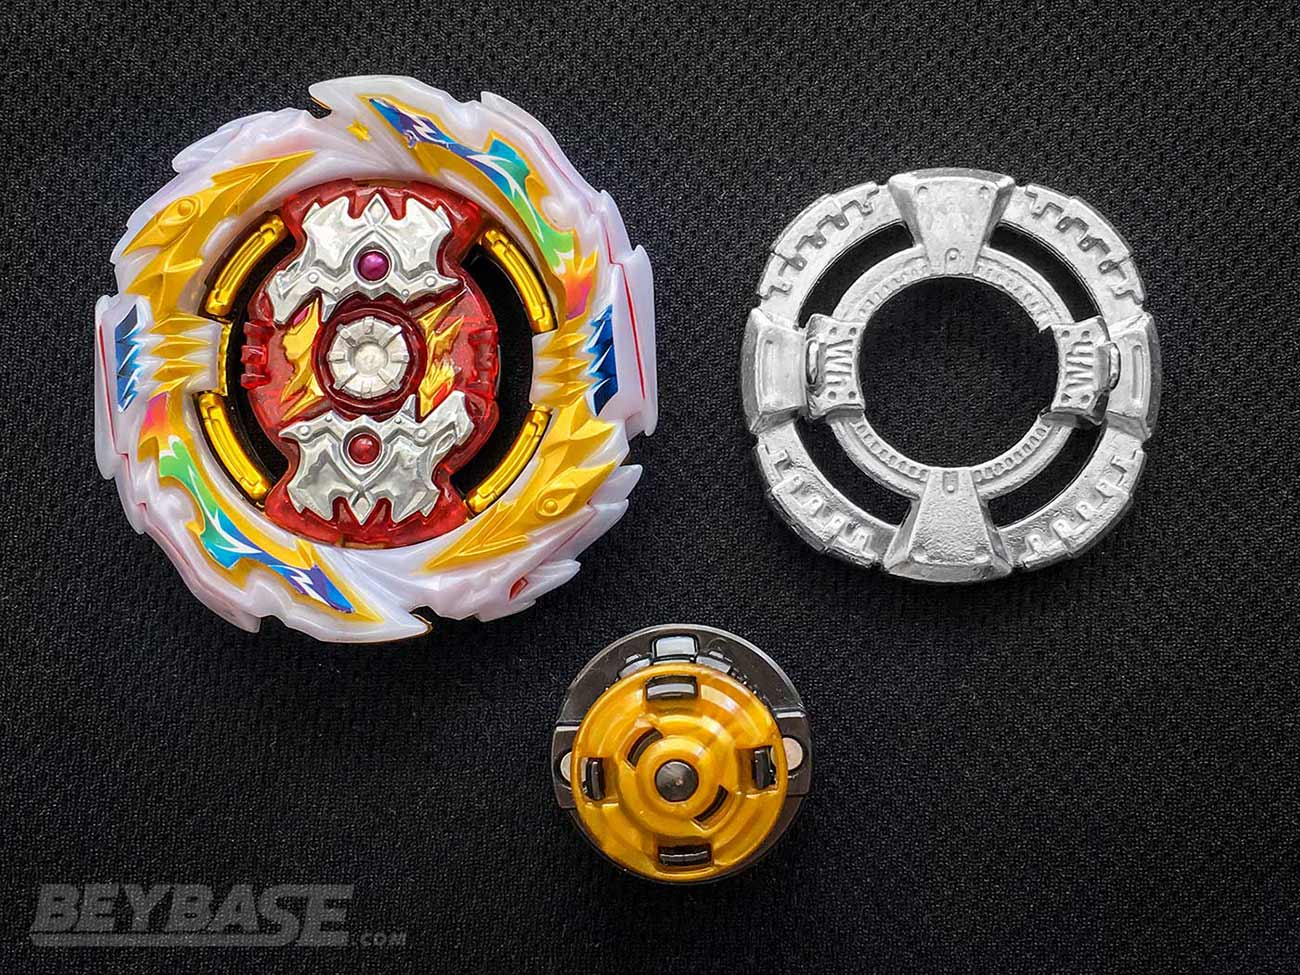 best beyblade burst stamina combo tempest solomon metal chip core wheel xtend plus 1s